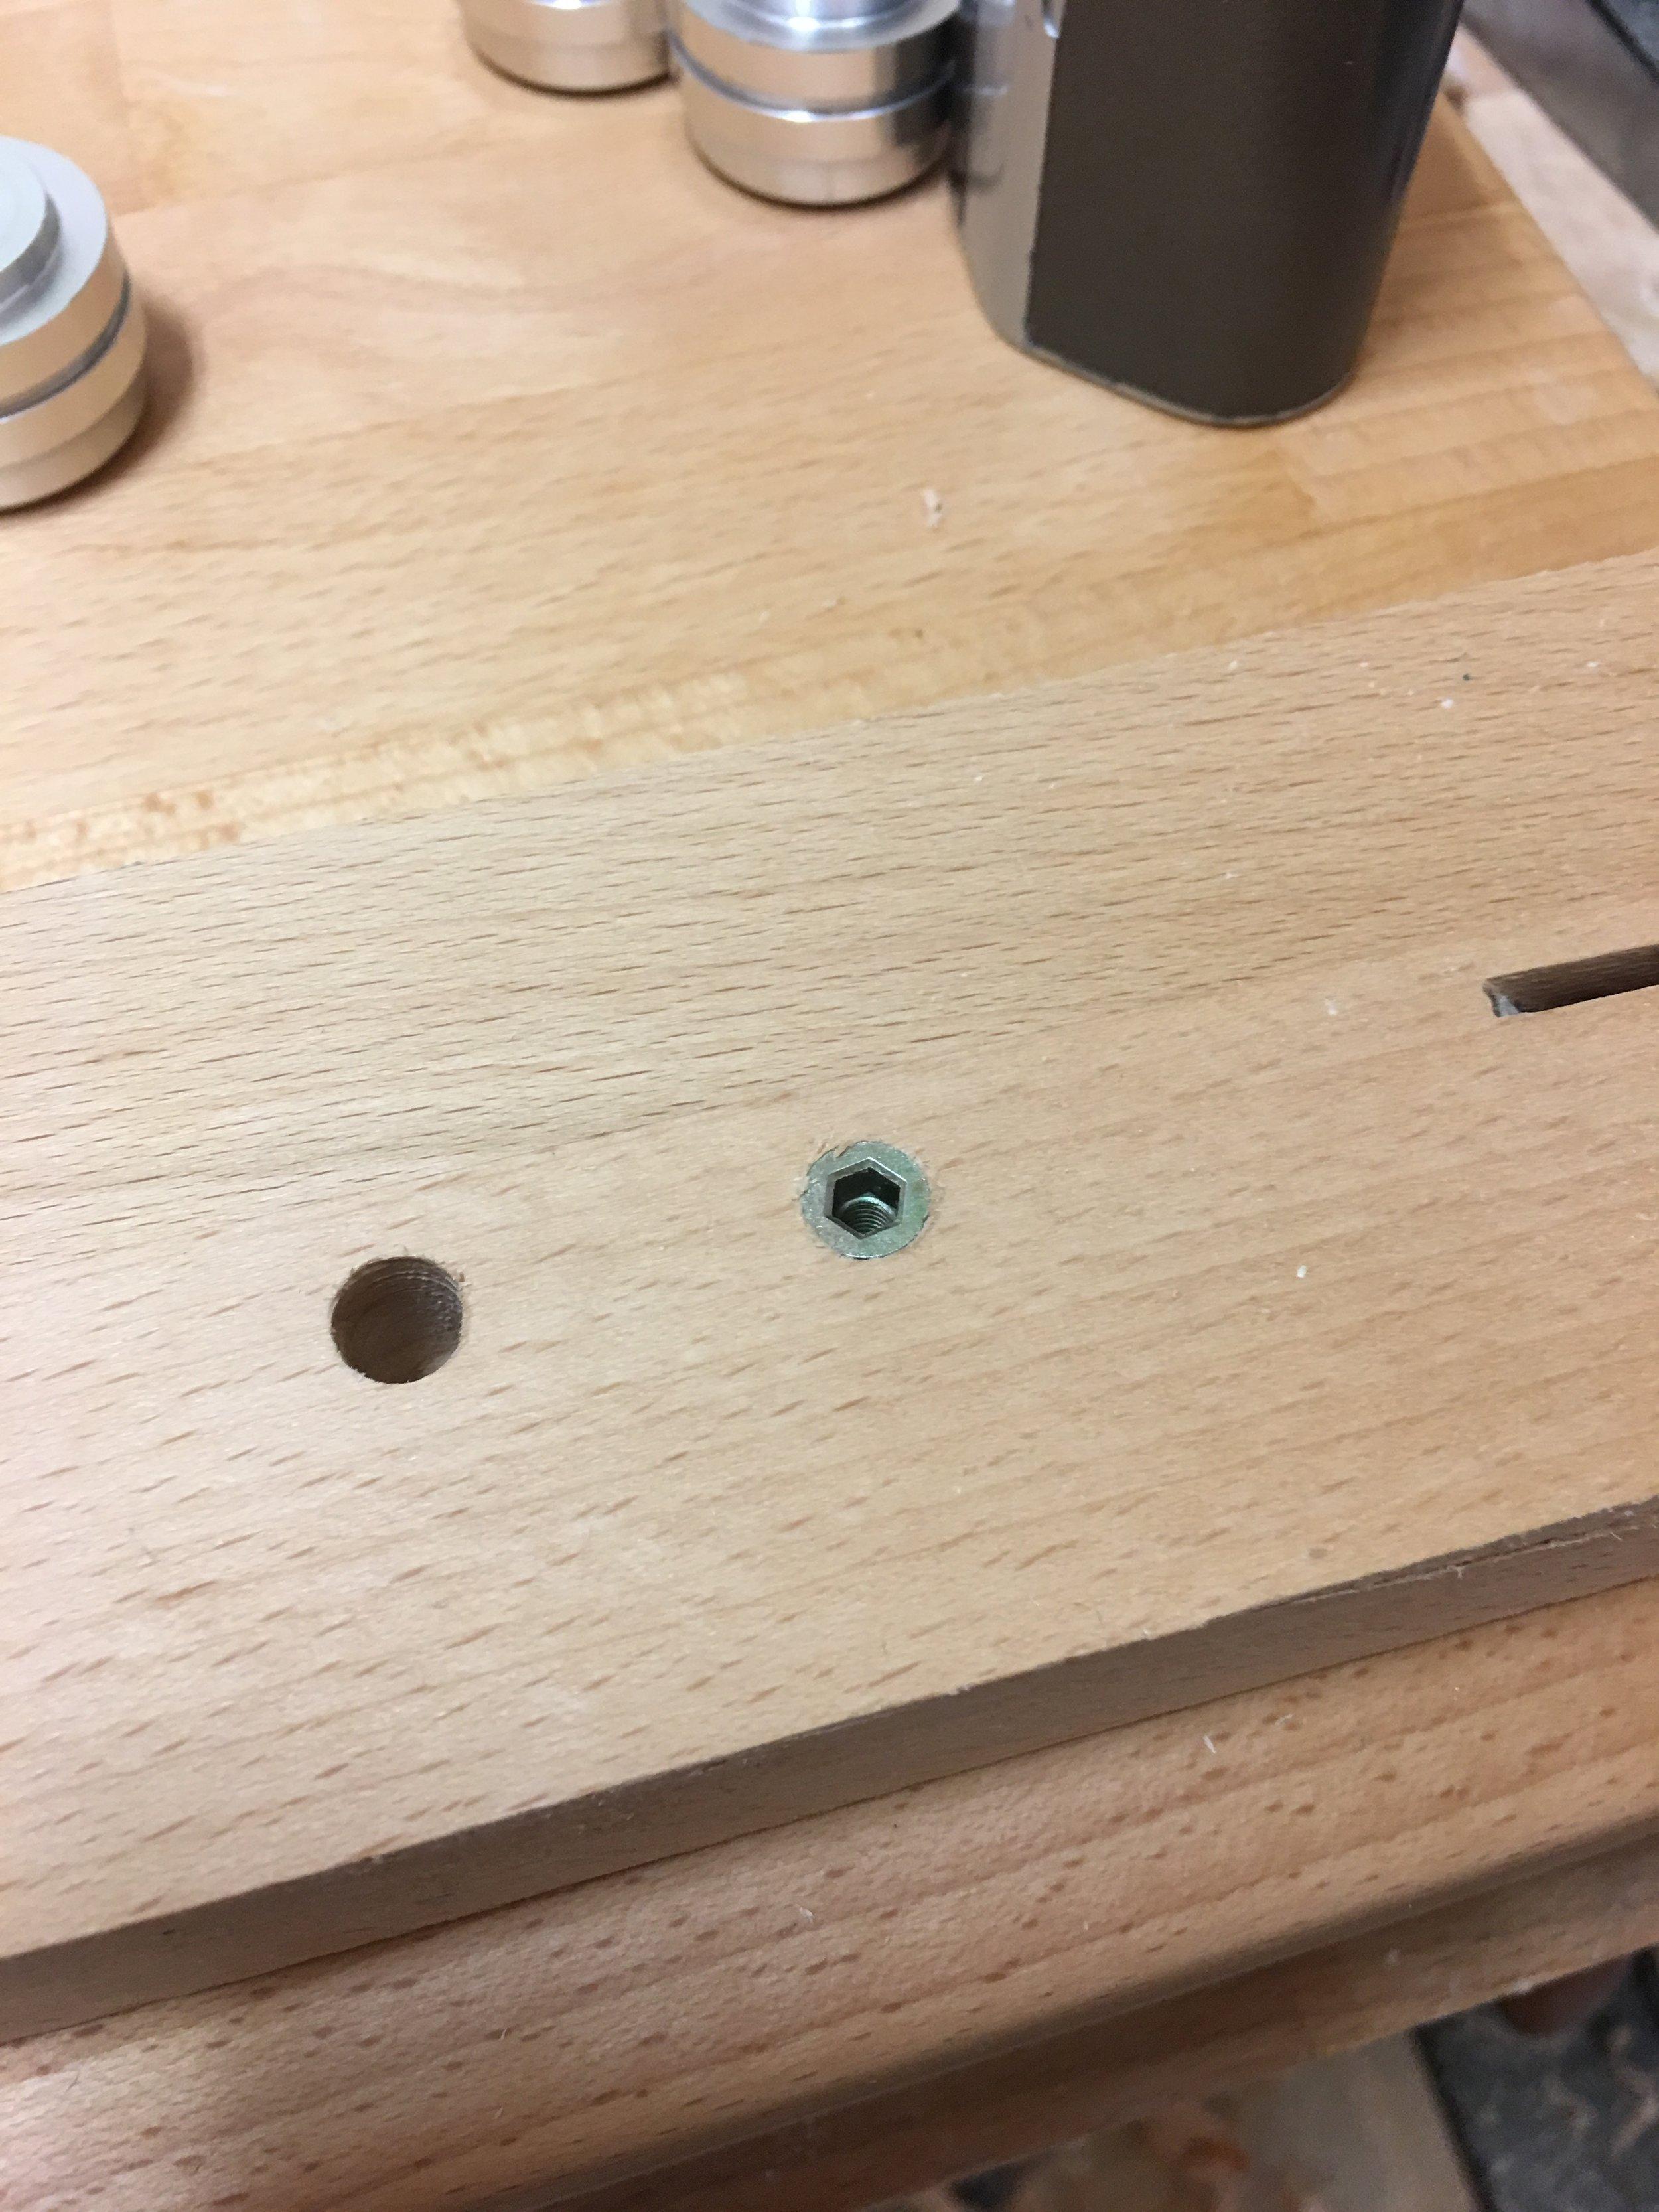 Test holes.